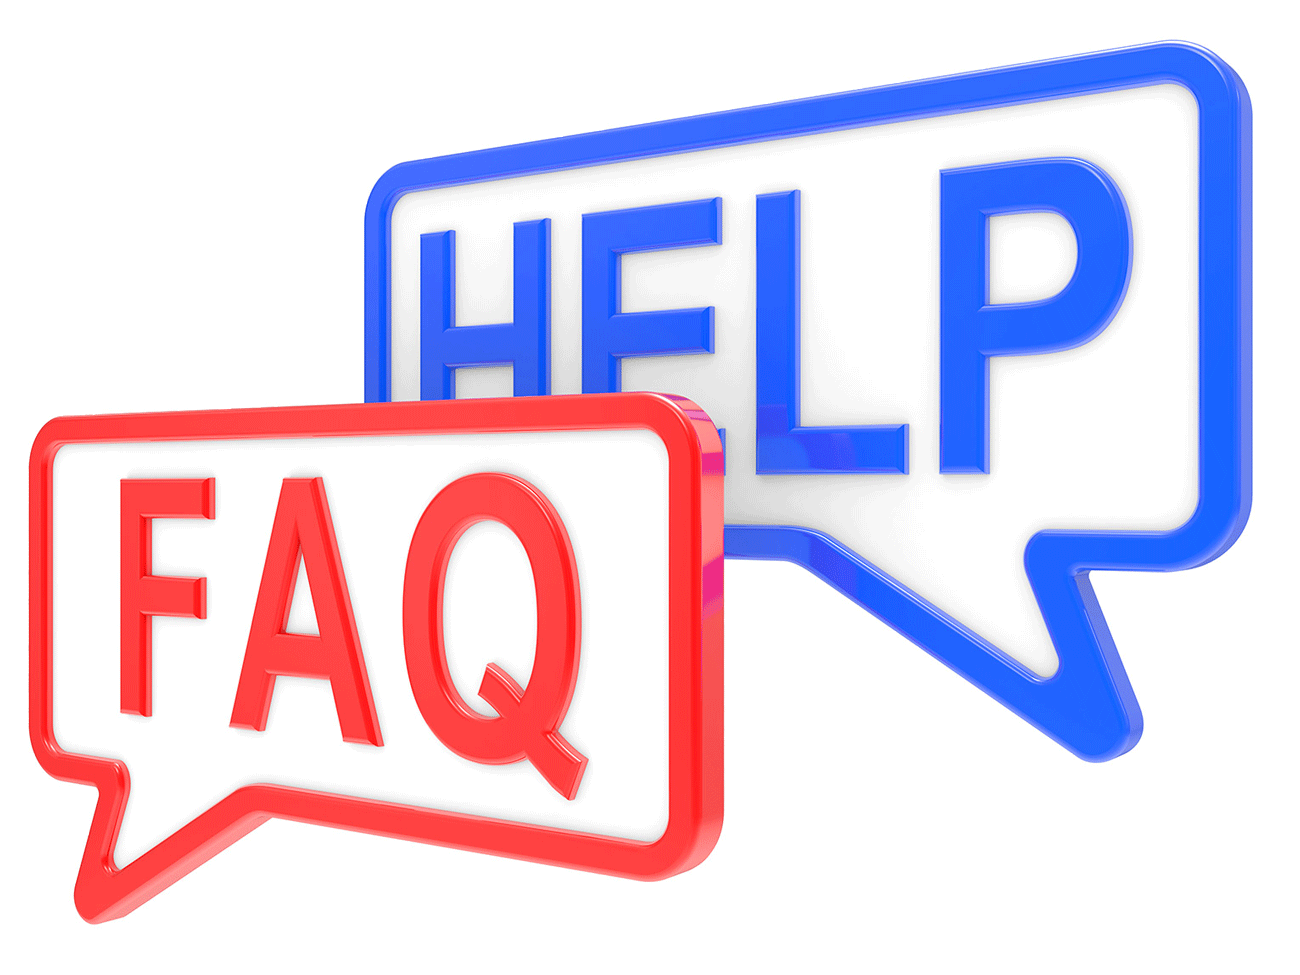 Help FAQ Signs